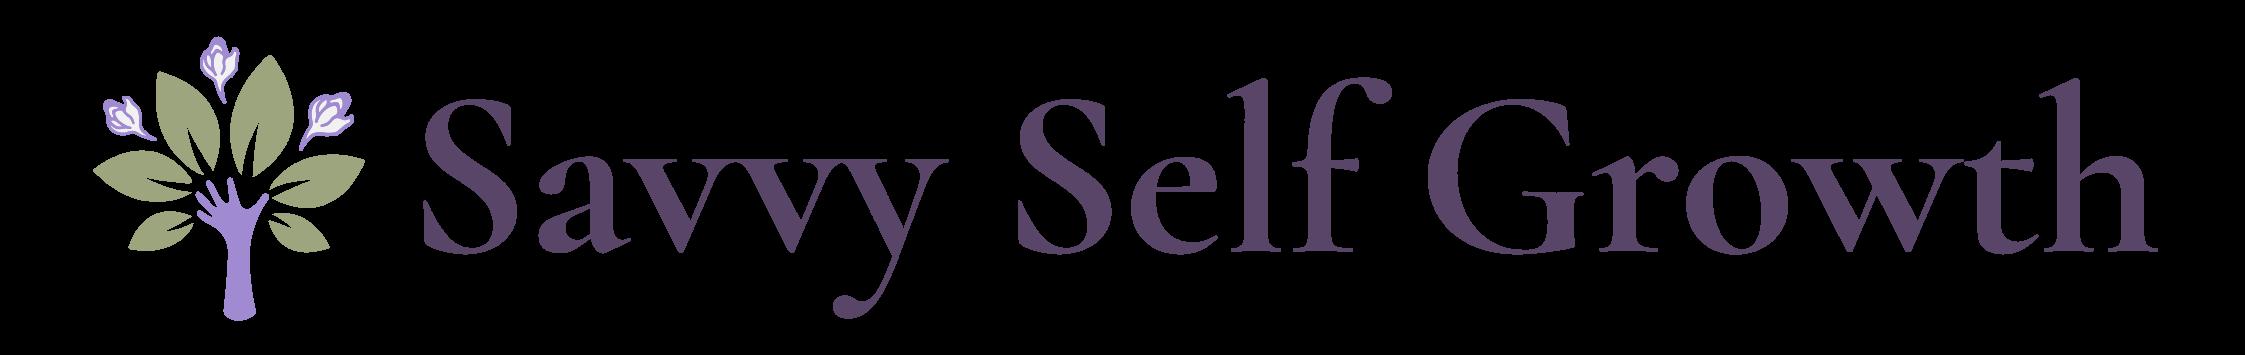 Savvy Self Growth